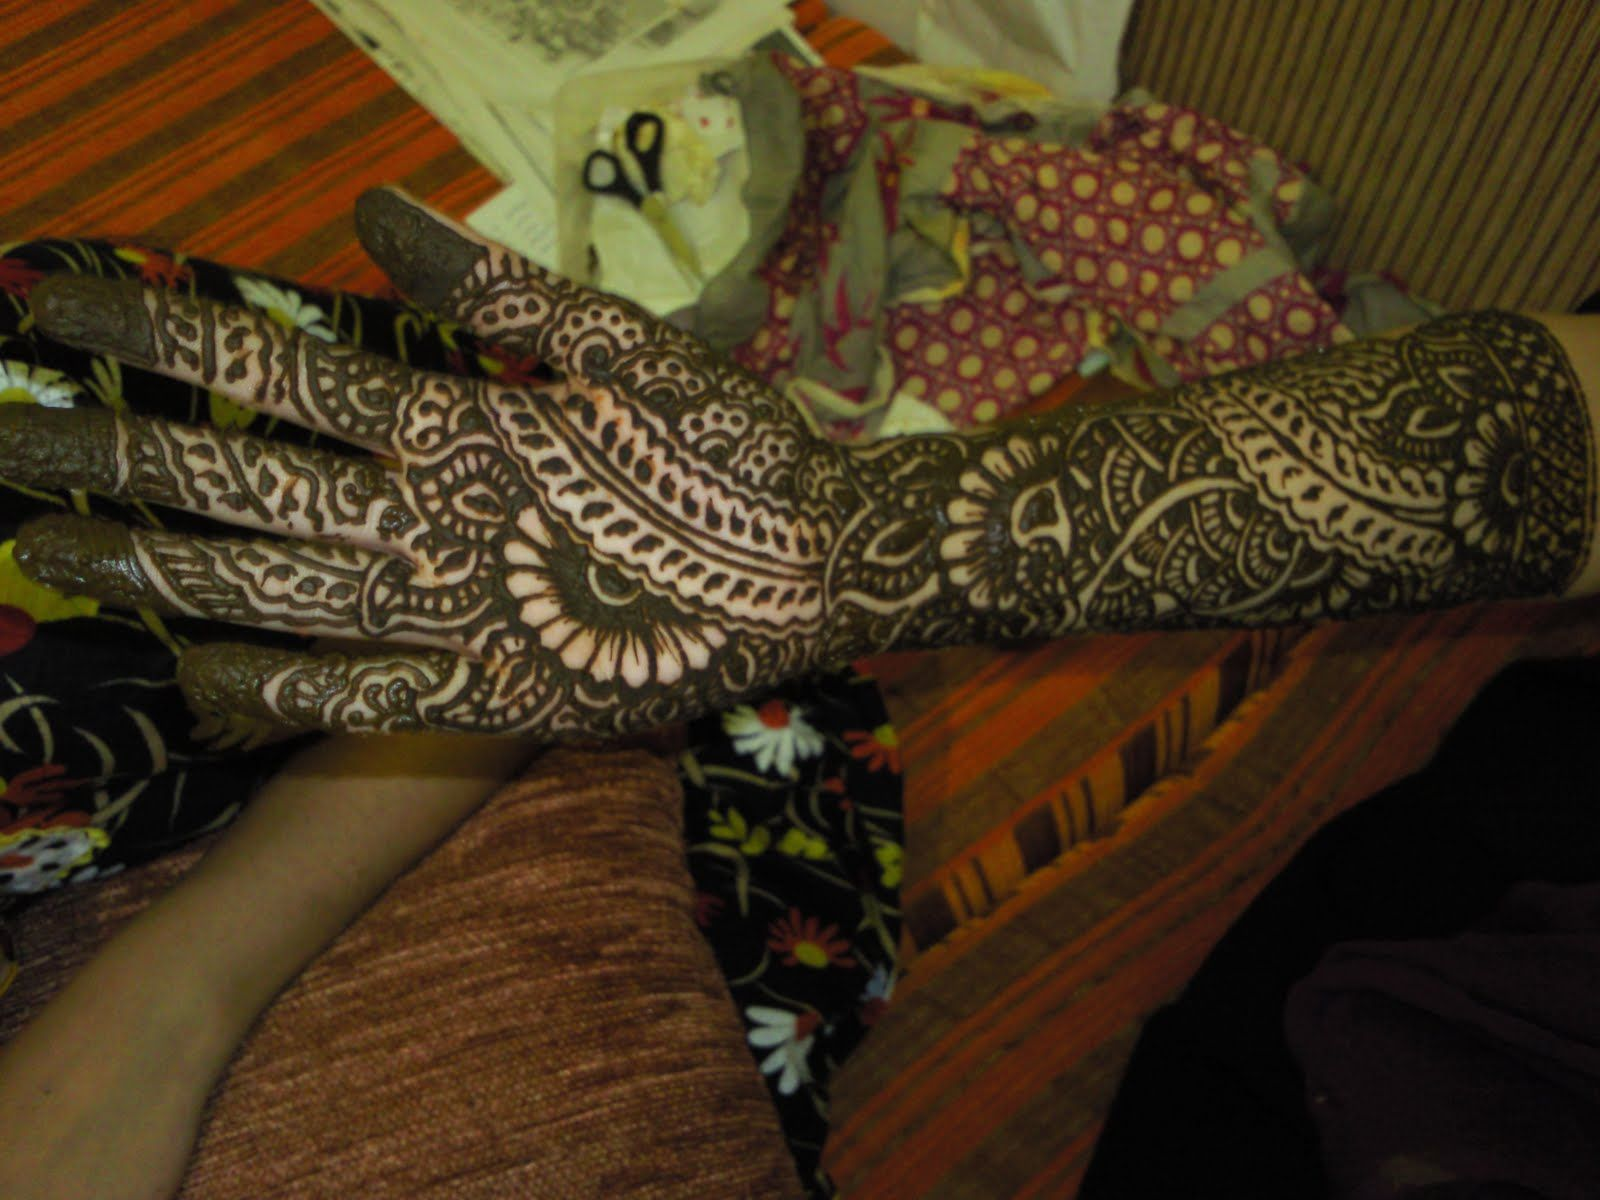 Attractive dulhan henna mehndi design for full hand - 1000 Images About Heavy Dulhan Mehndi On Pinterest Mehndi Bridal Mehndi And Mehandi Designs